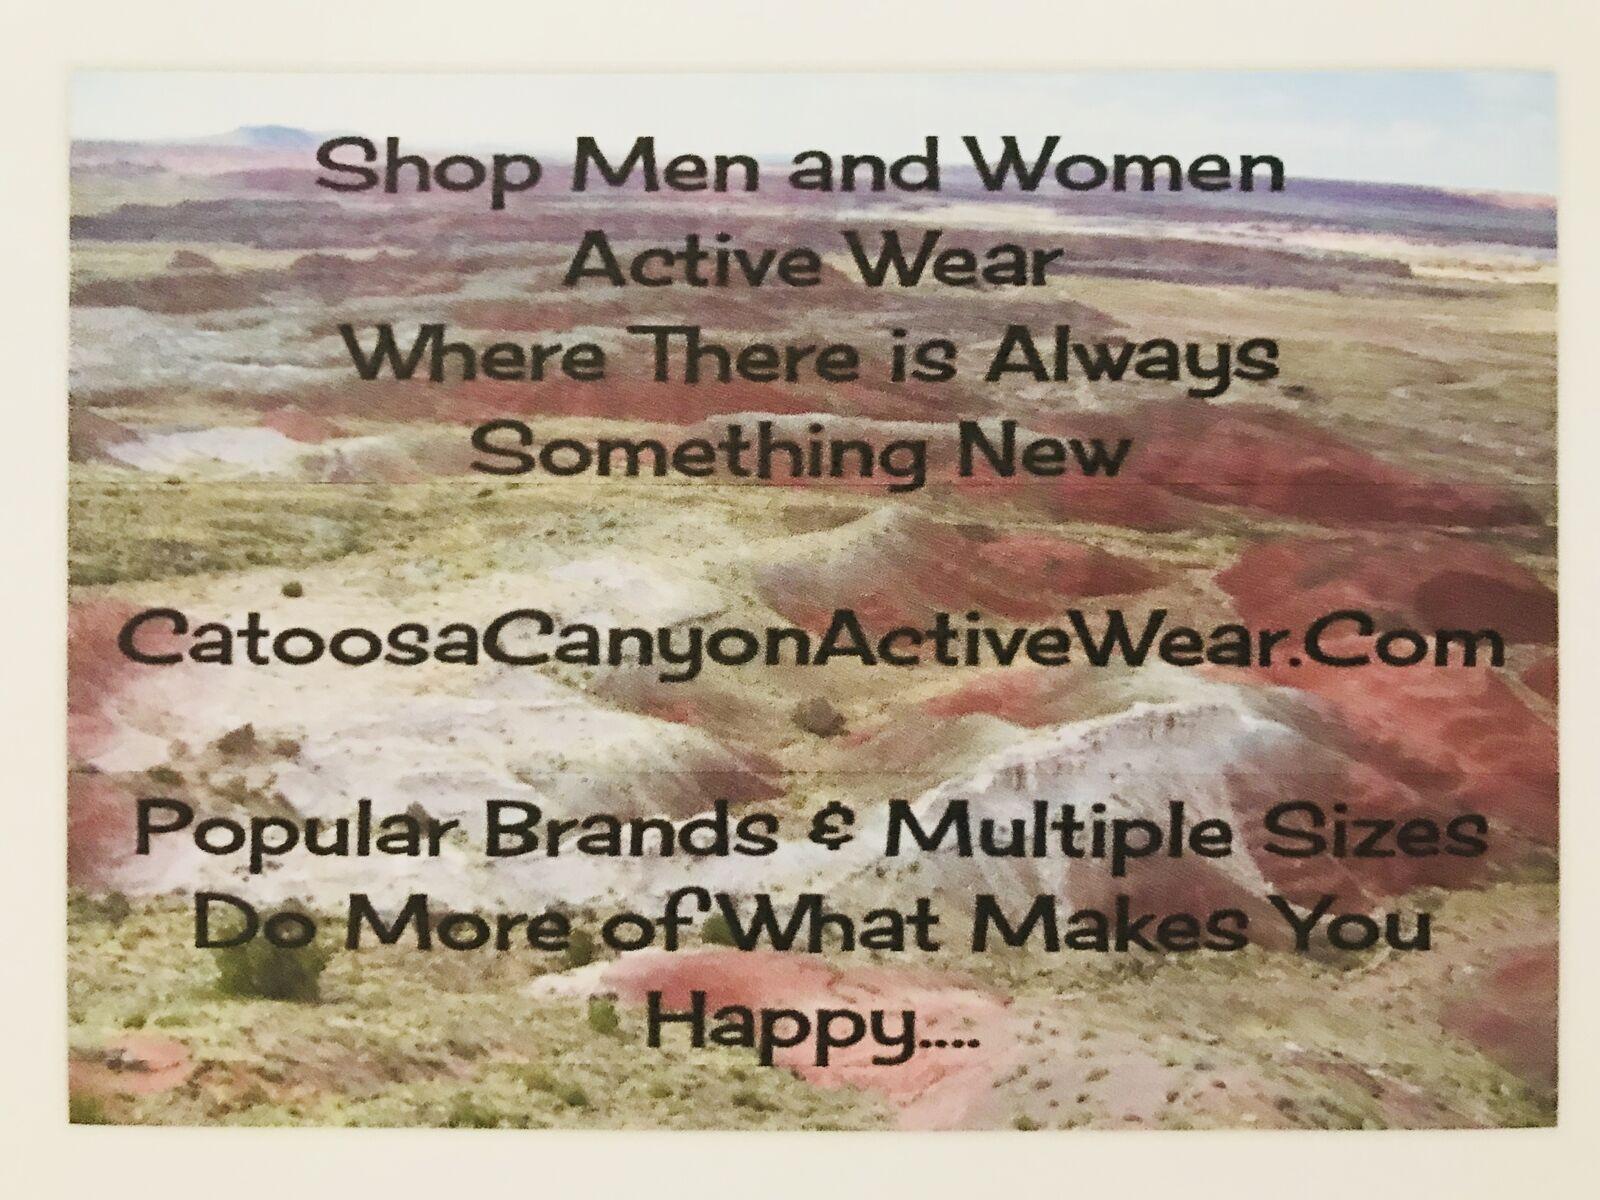 Catoosa Canyon Active Wear